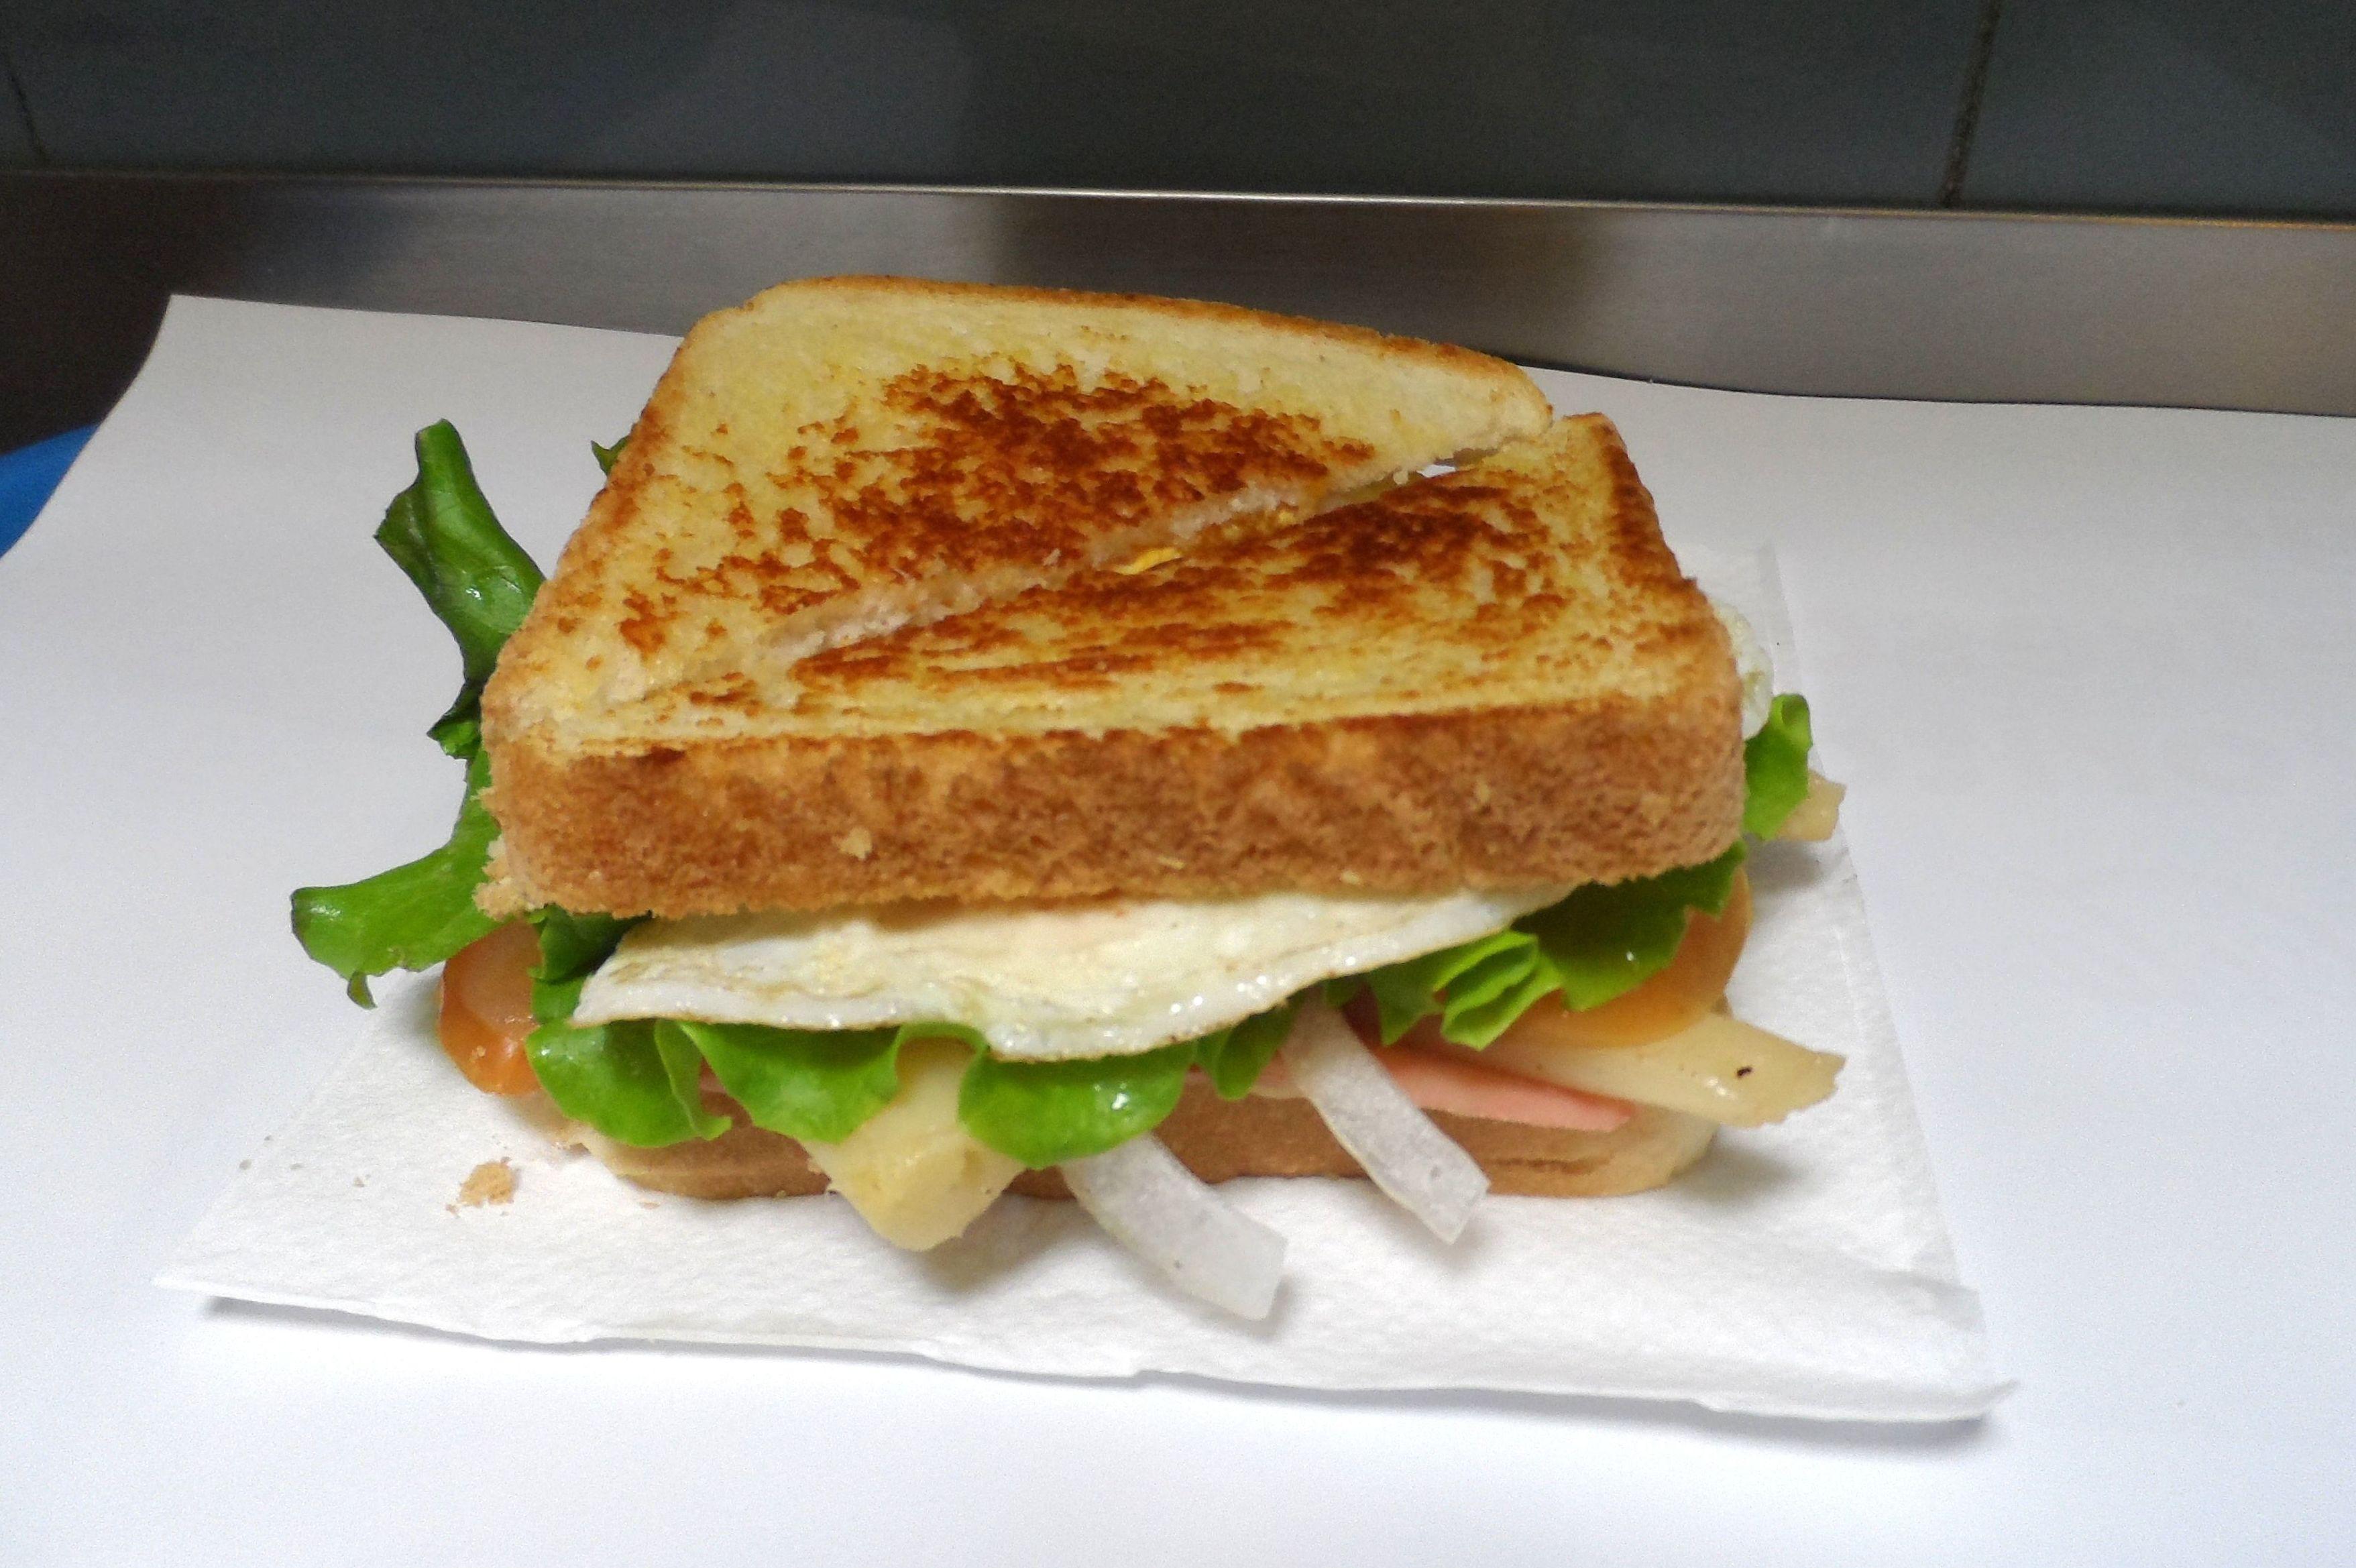 Sándwiches con ingredientes de calidad en O Grove